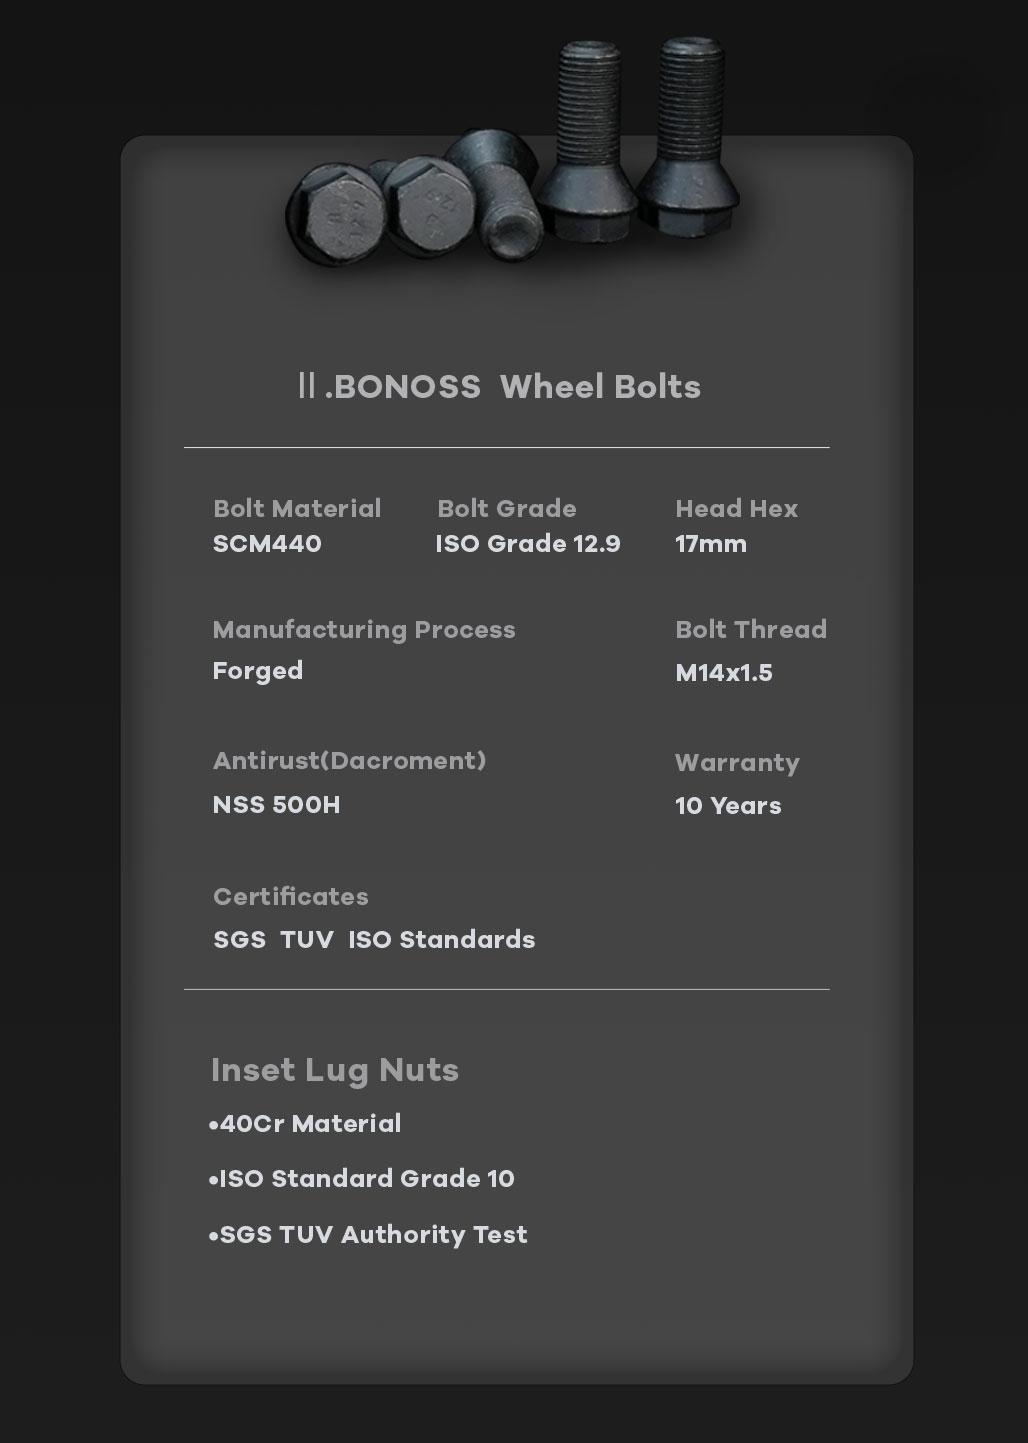 BONOSS-forged-active-cooling-5-Lug-wheel-spacers-(custom-wheel-spacers)-M14x1.5-by-lulu-10